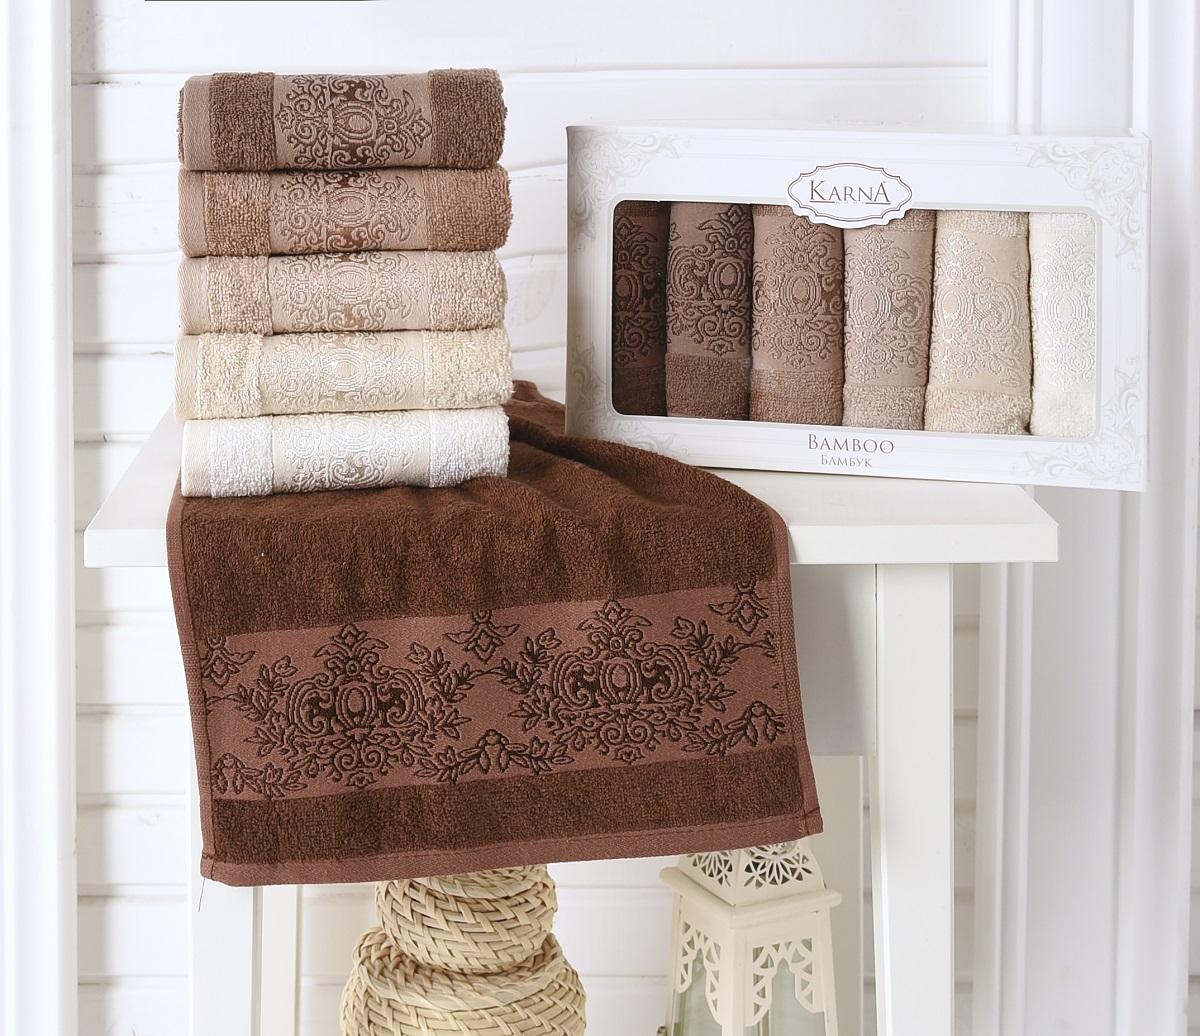 Набор кухонных полотенец Karna Pandora, 30 х 50 см, 6 шт. 2200/CHAR0032200/CHAR003